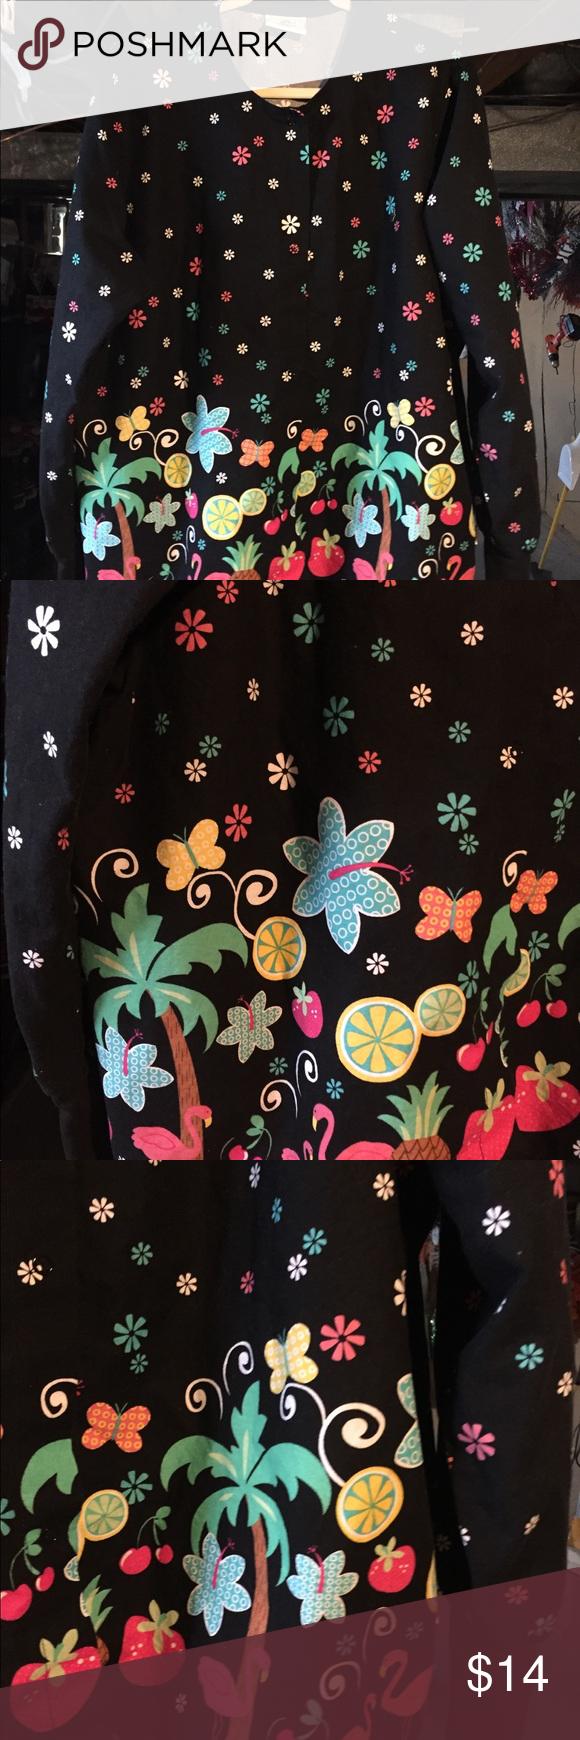 SALE Scrub Jacket | Scrub jackets, Jackets, Scrubs